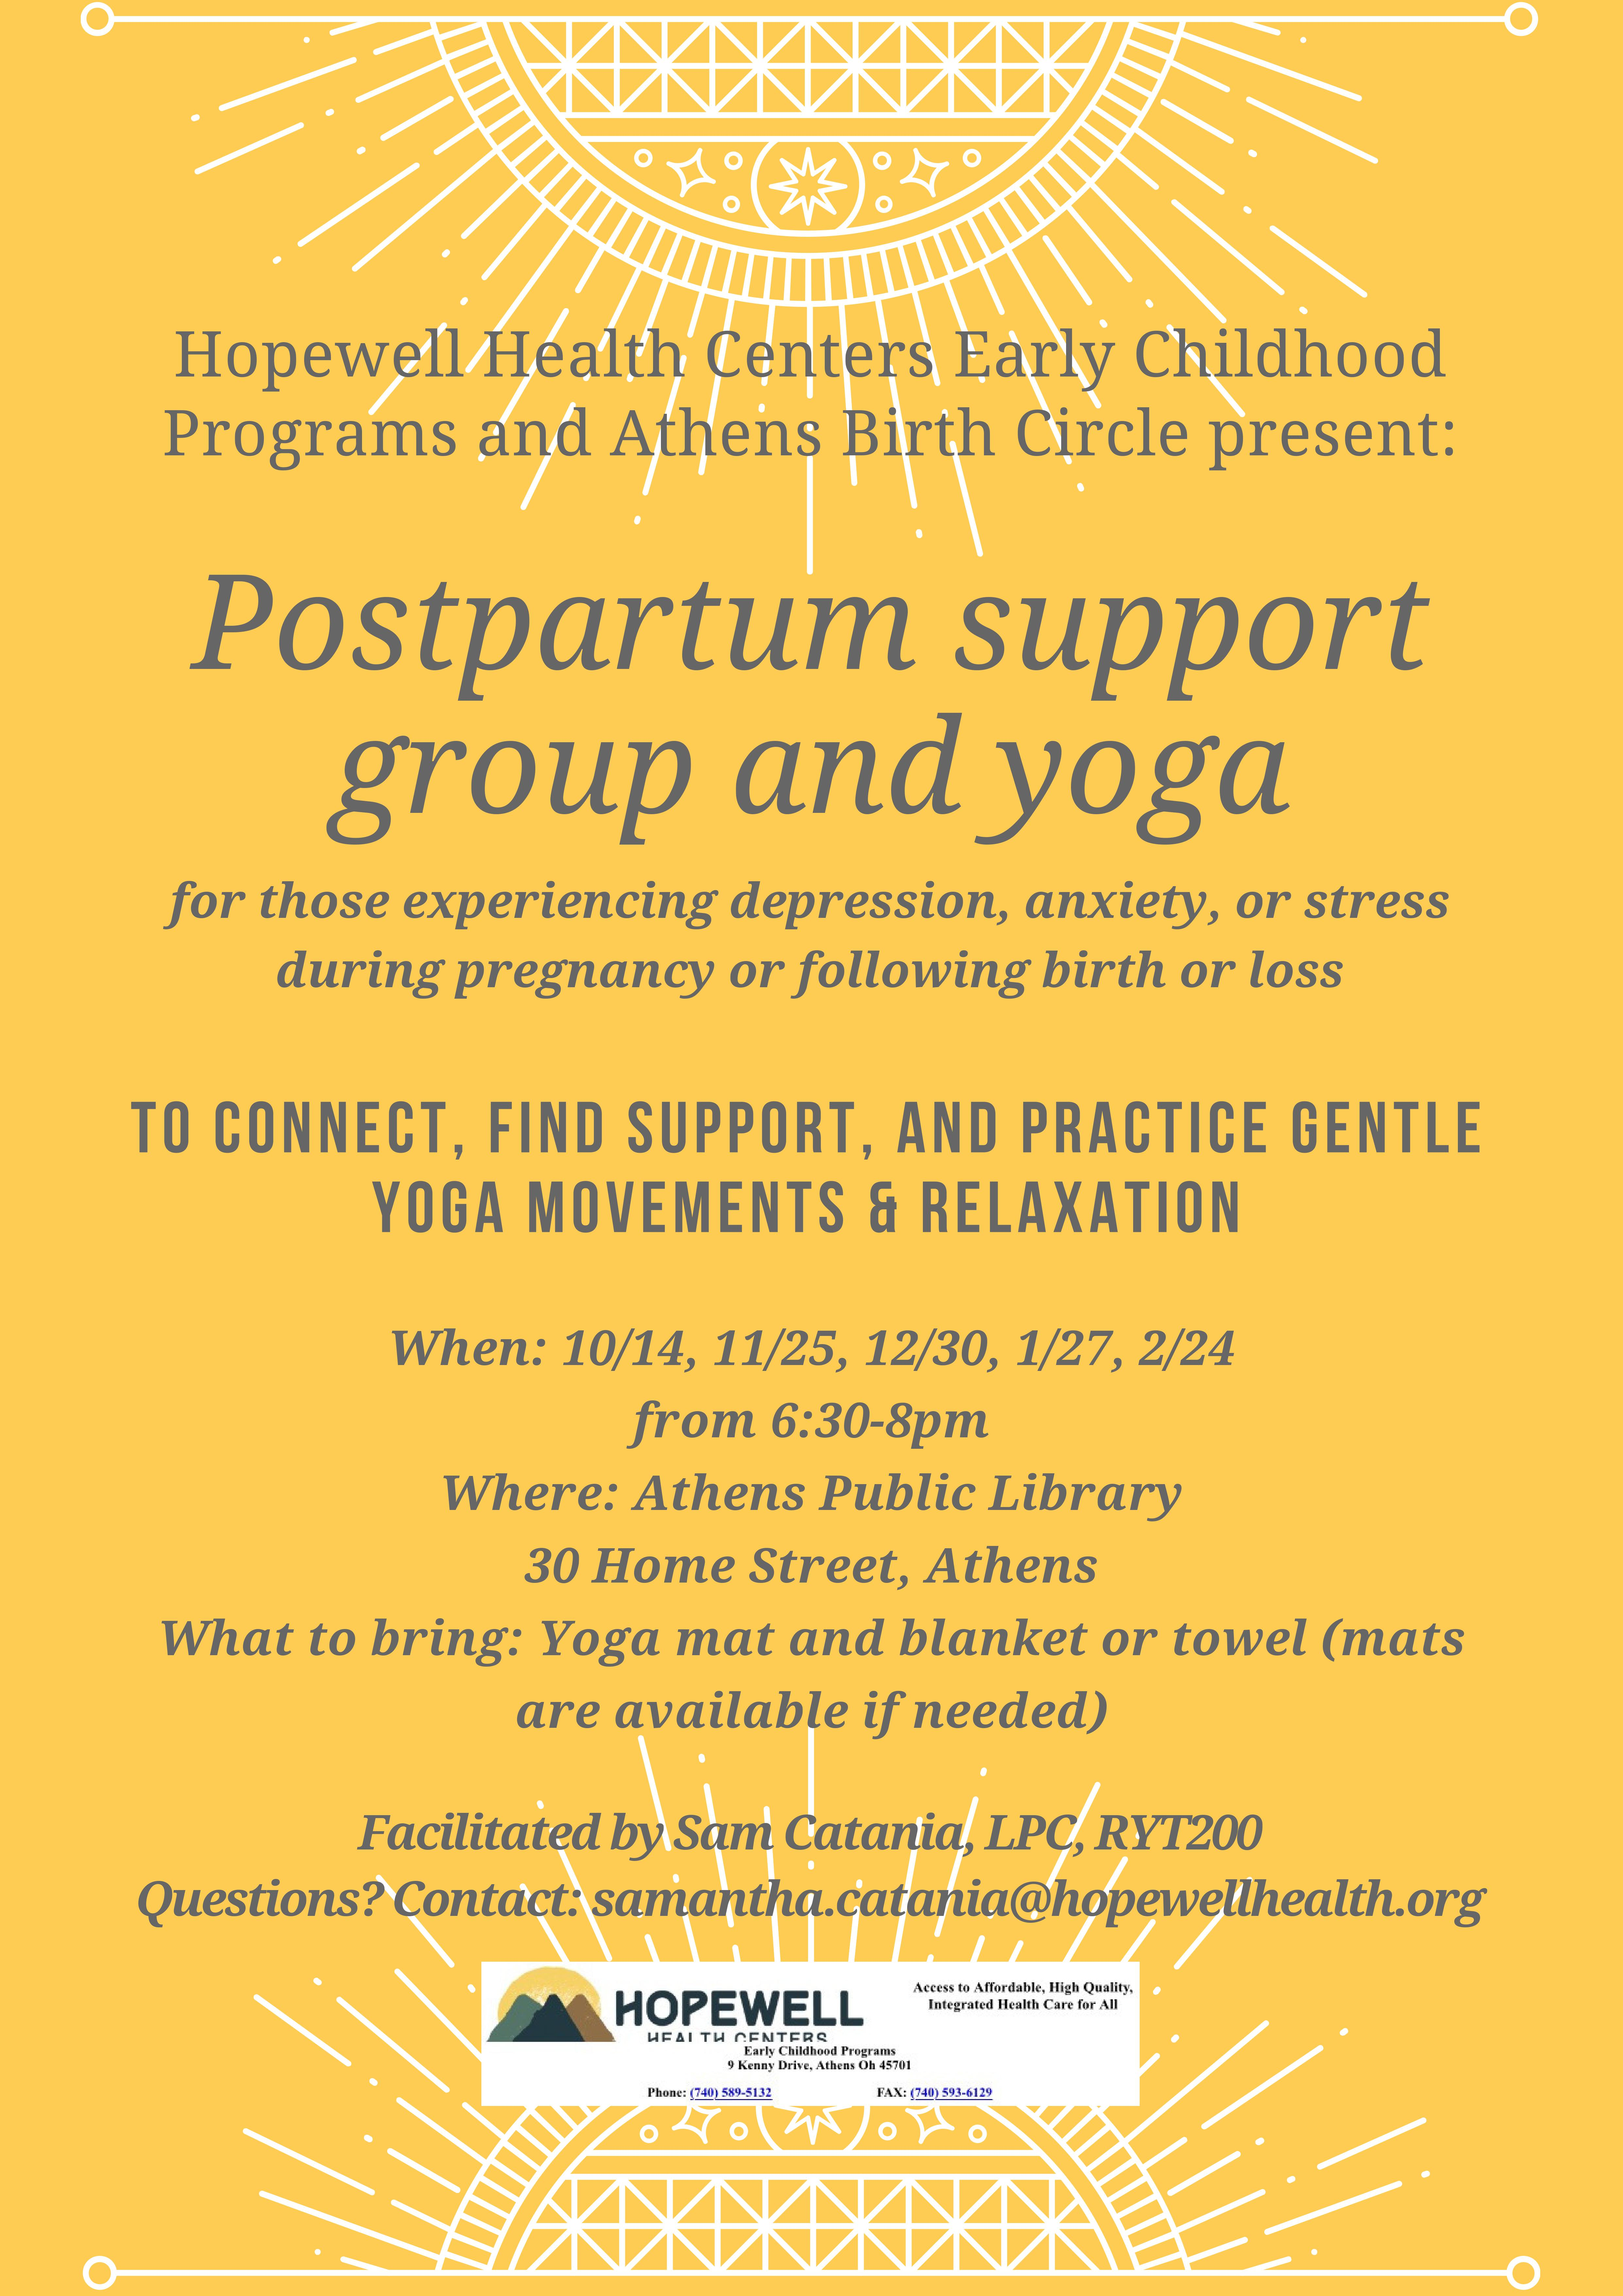 Post partum support group flier